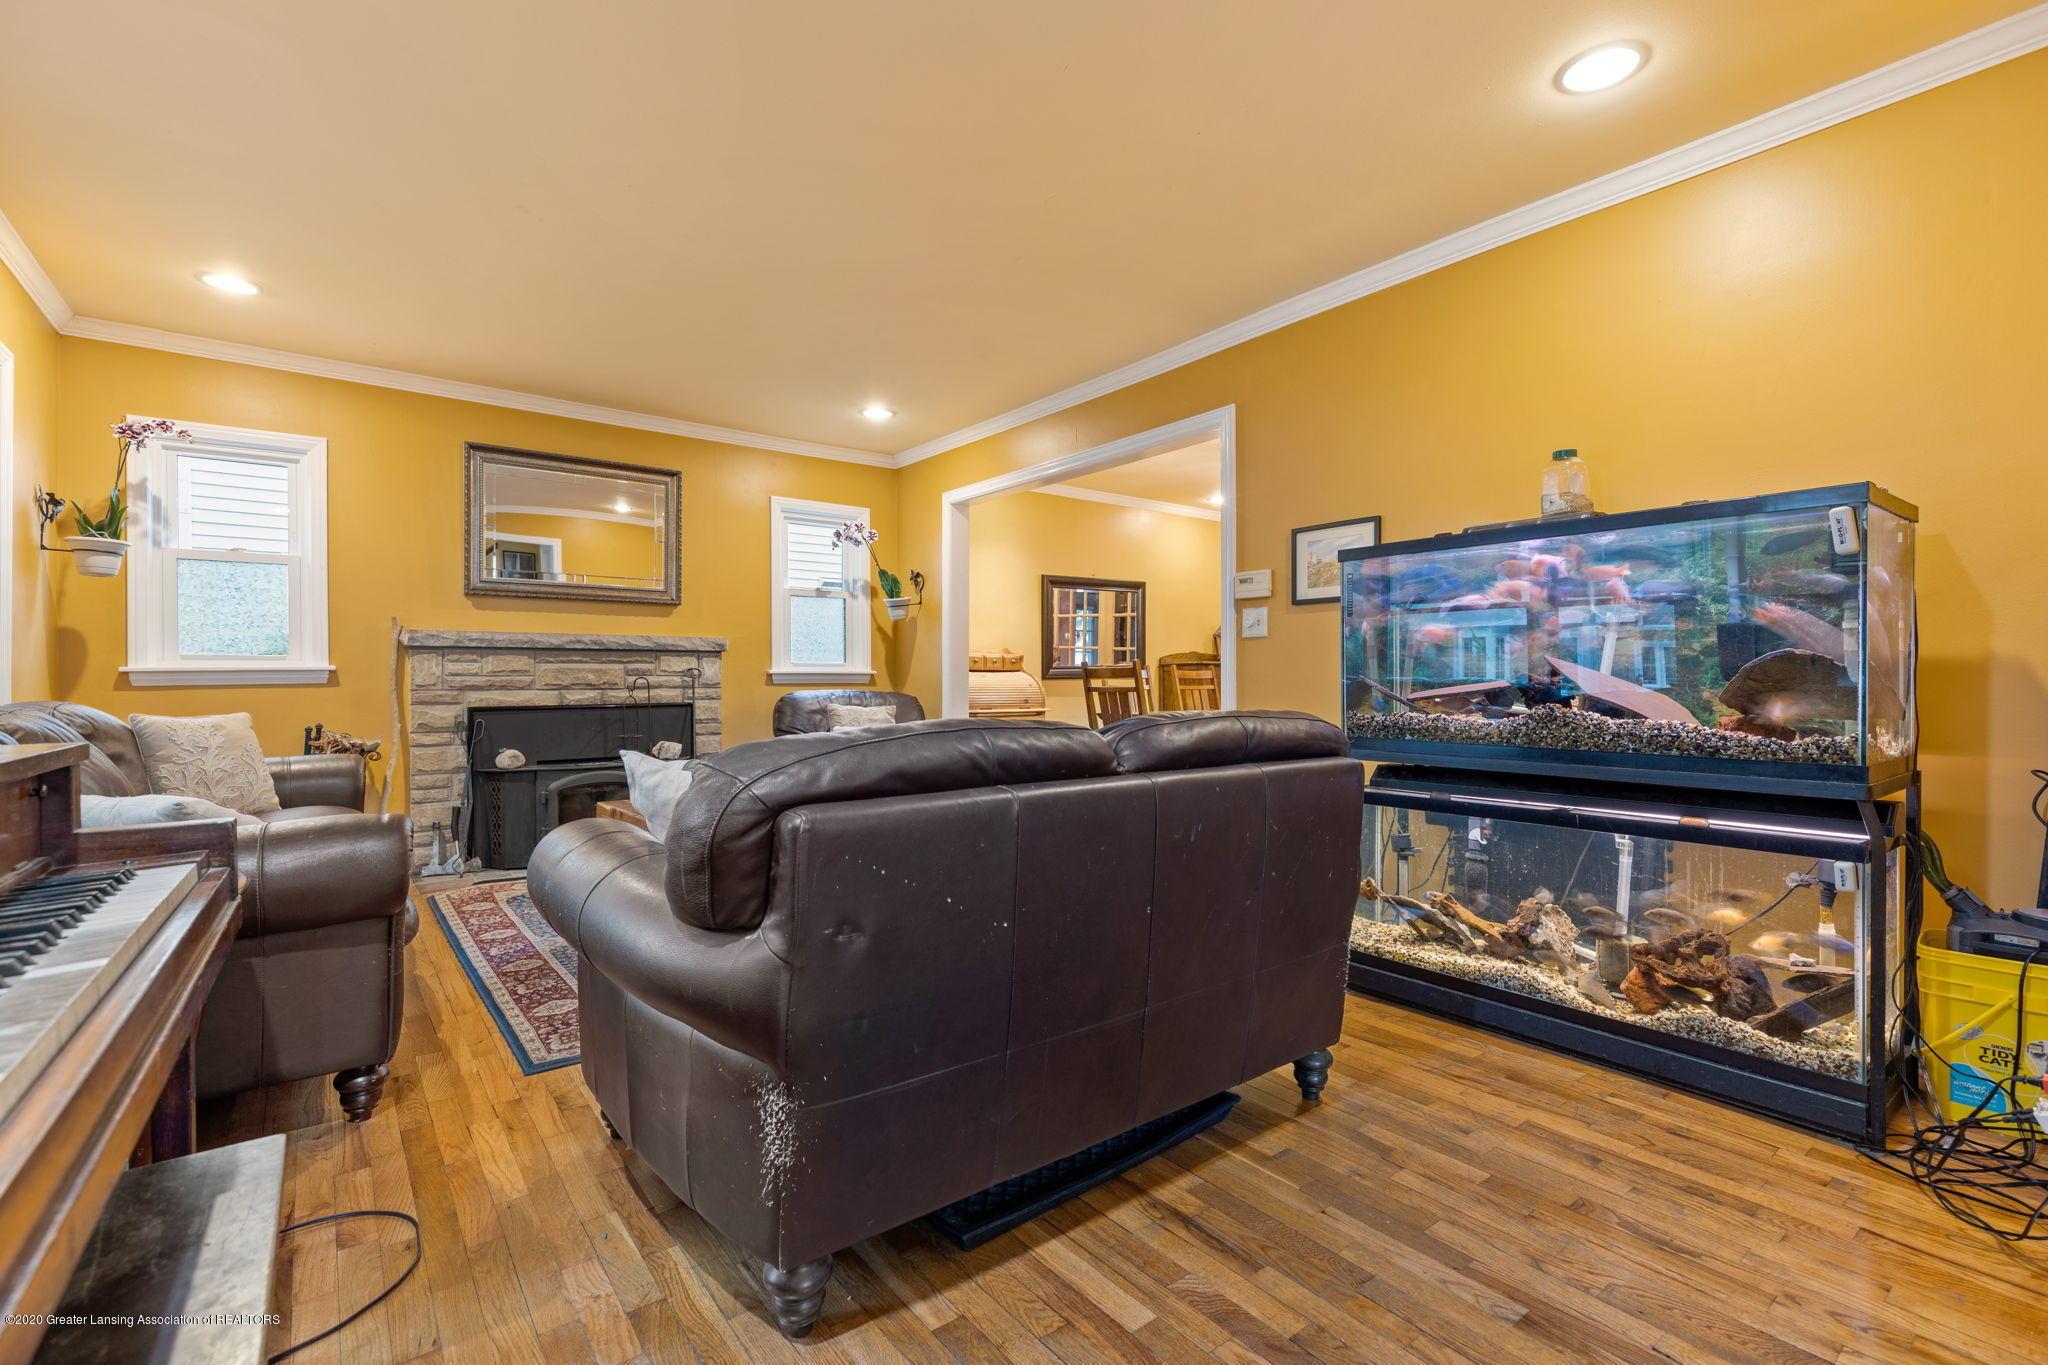 510 Meadowlawn St - Living Room - 3